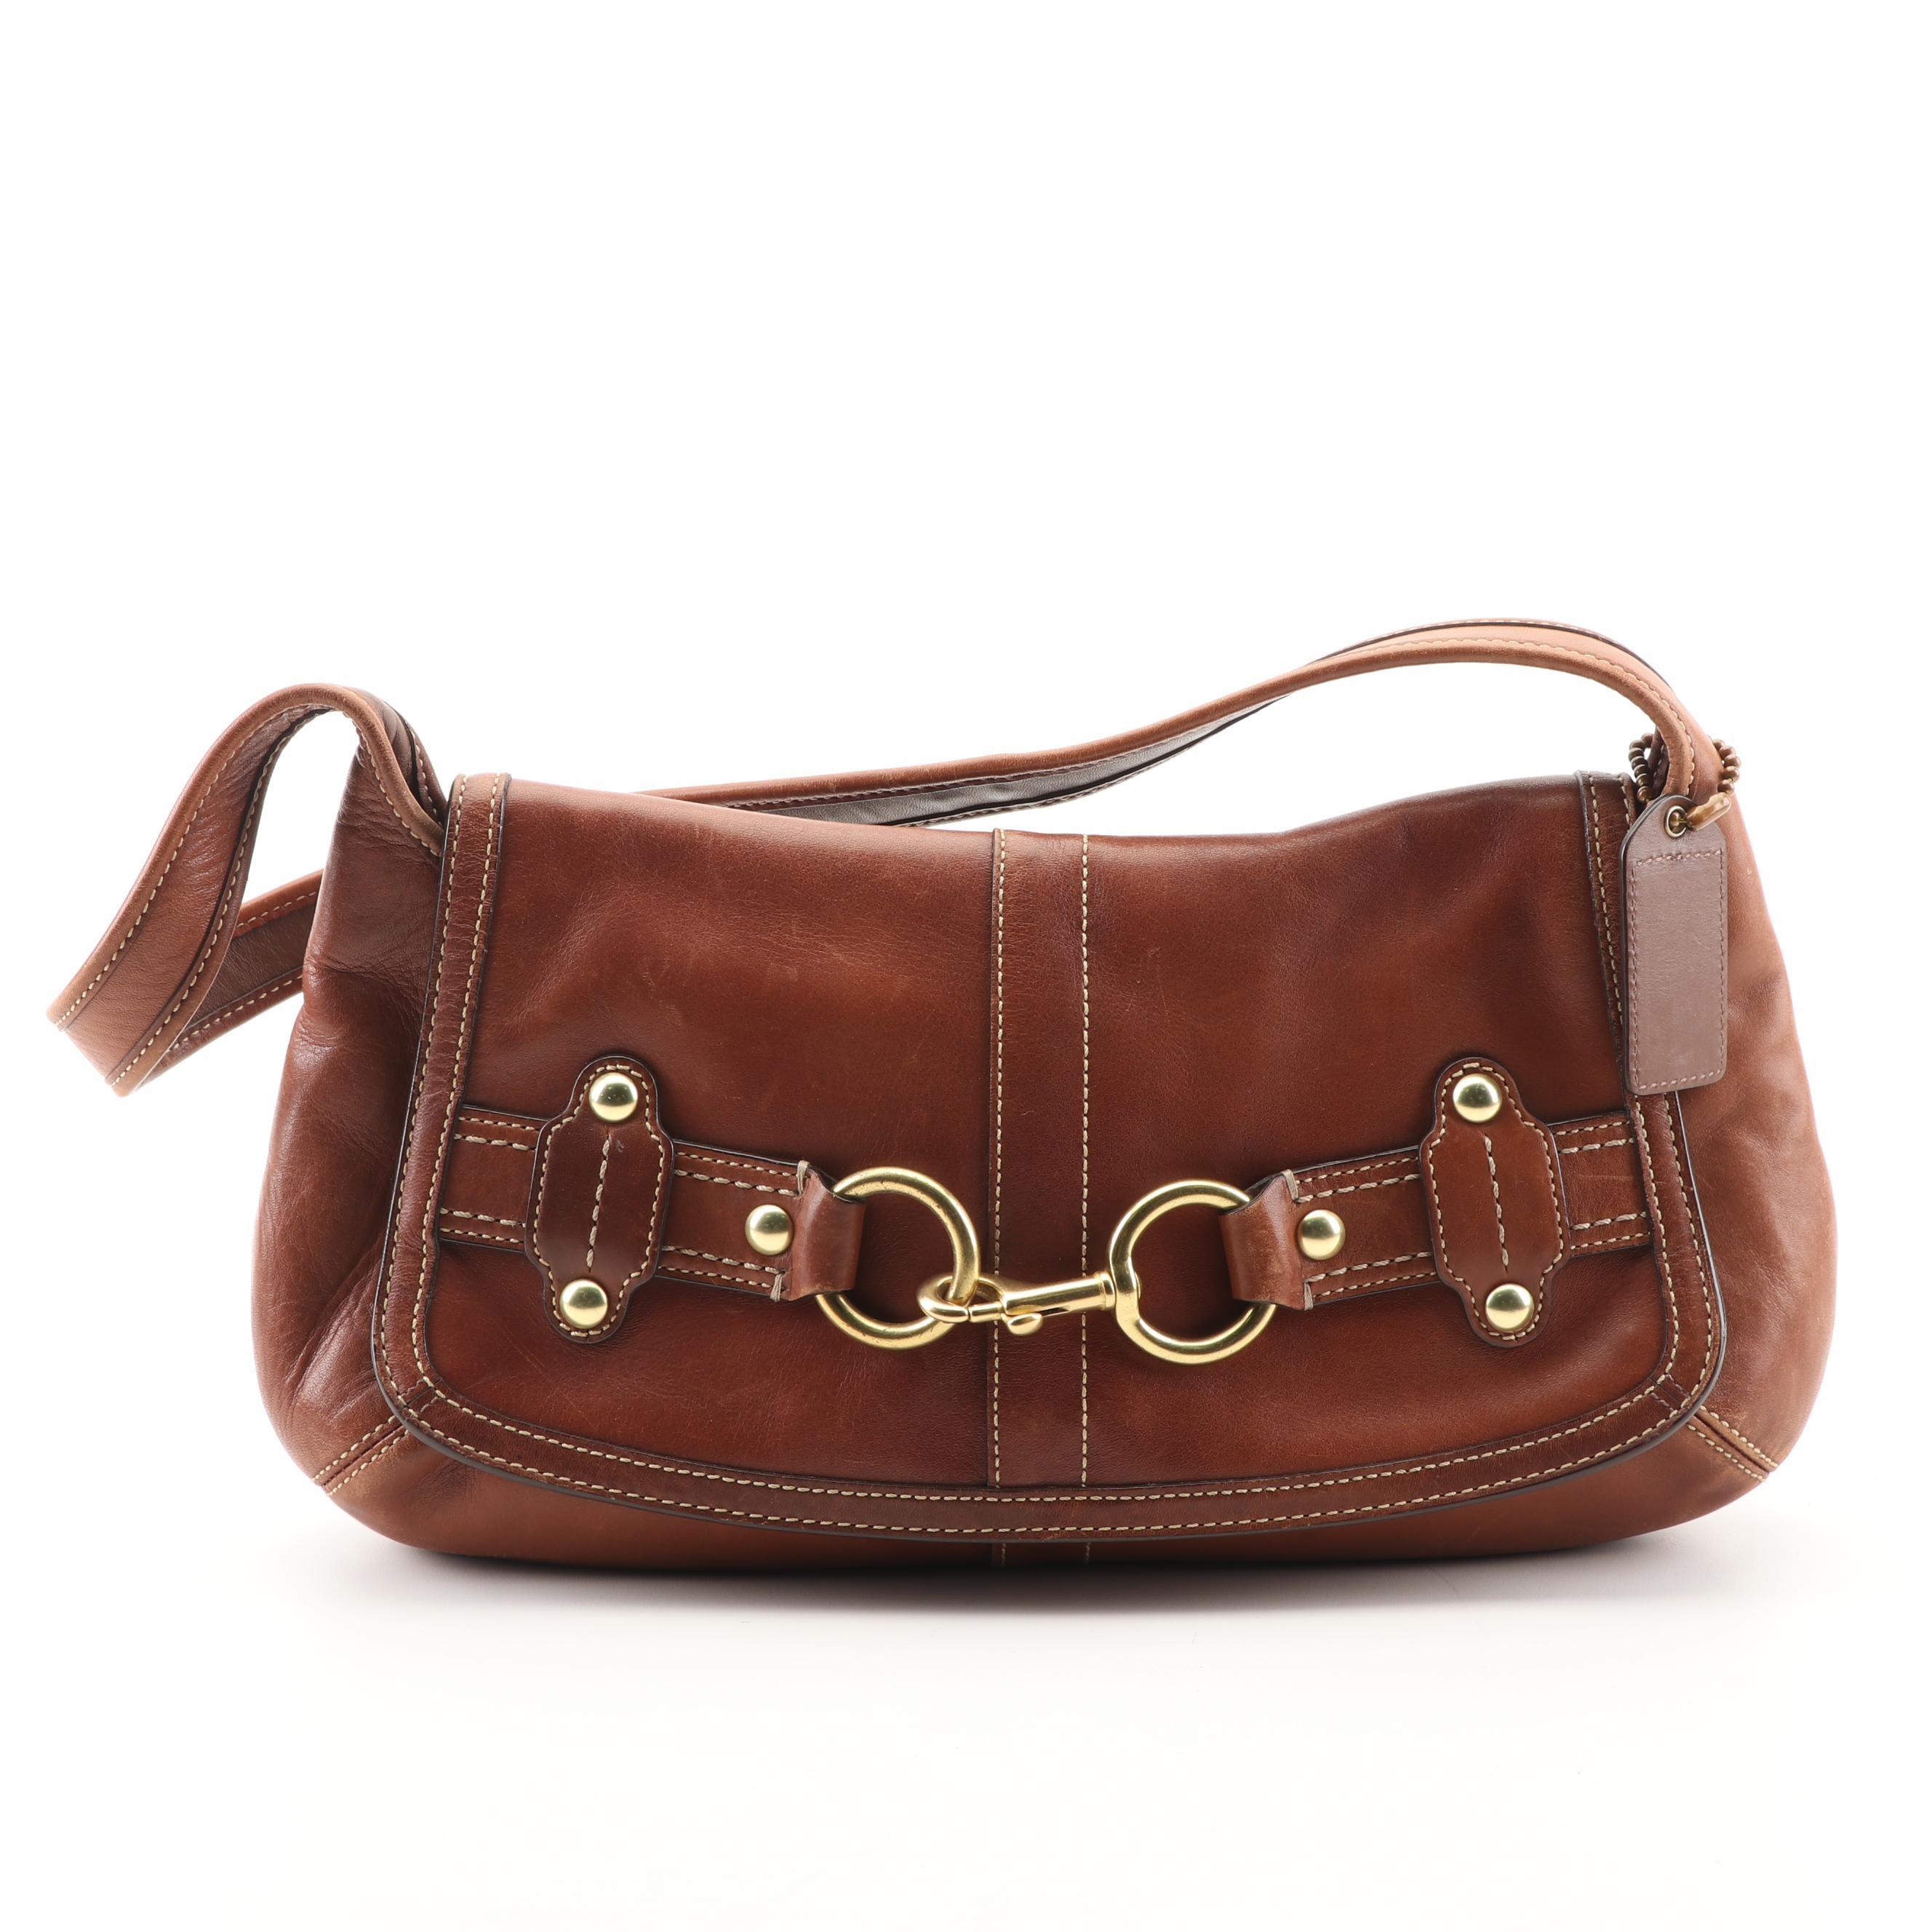 Coach Ergo Purse Brown Leather Belted Handbag